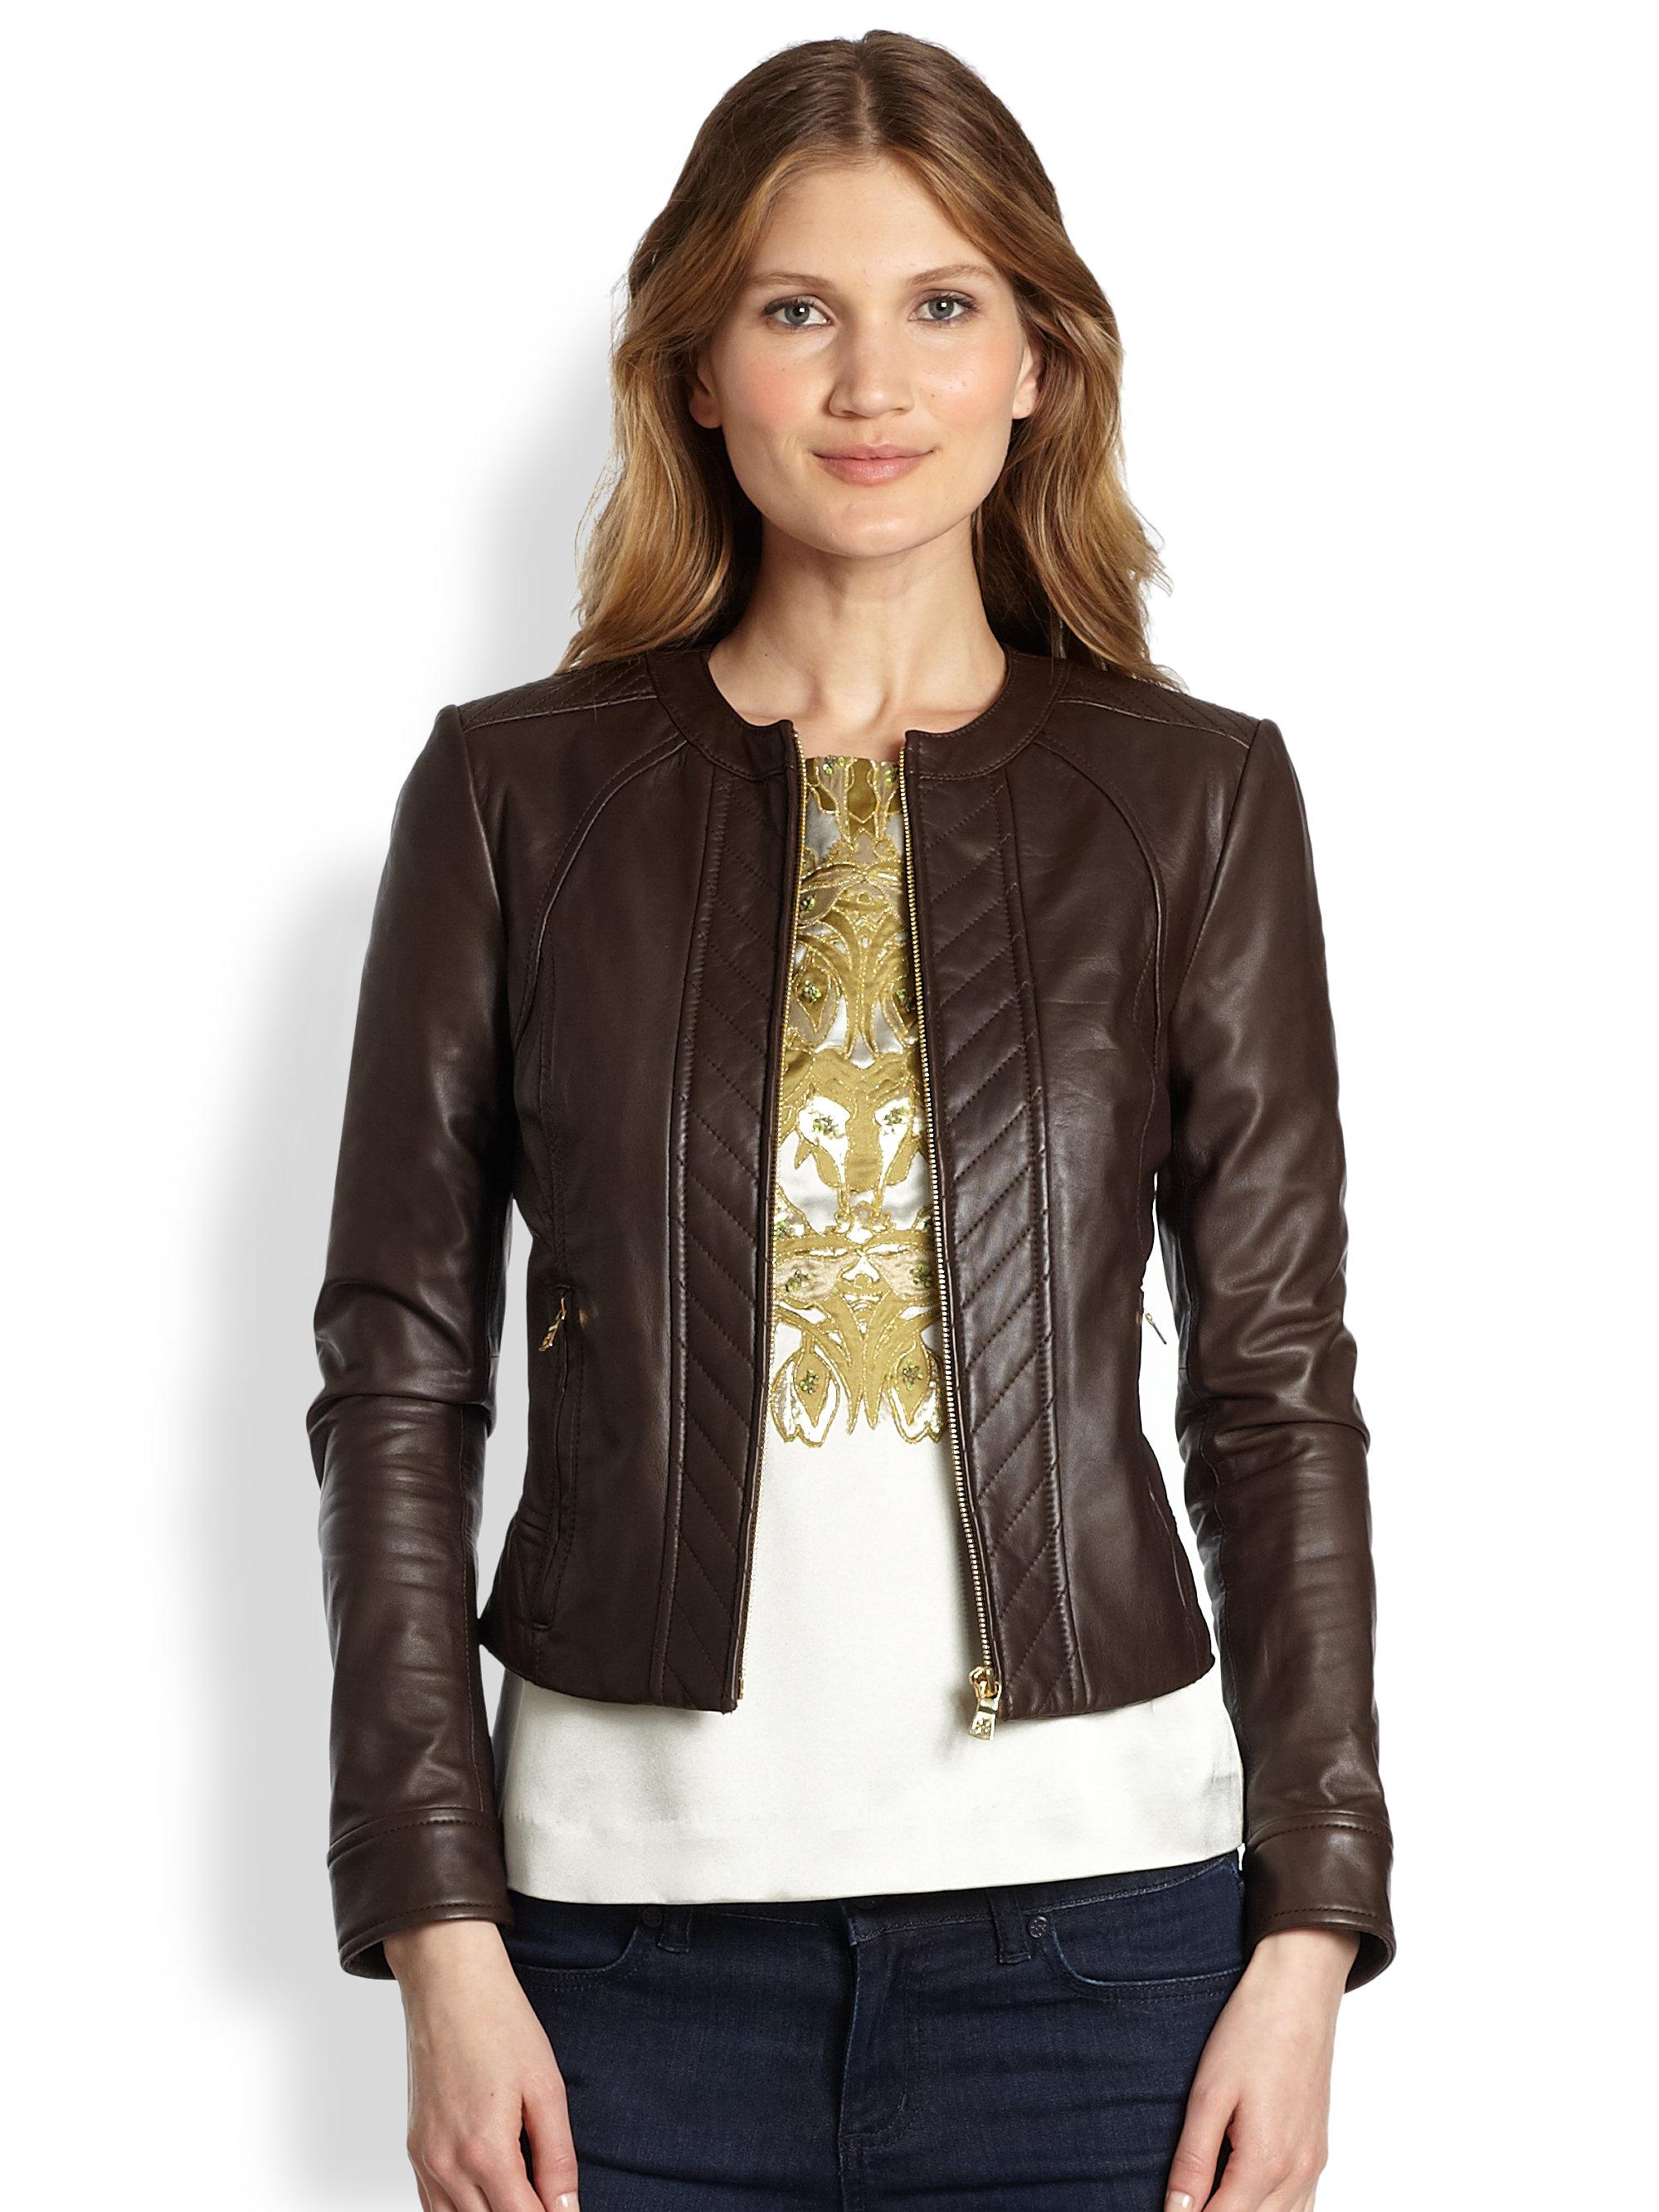 Tory Burch Daphne Lambskin Leather Jacket In Brown Lyst